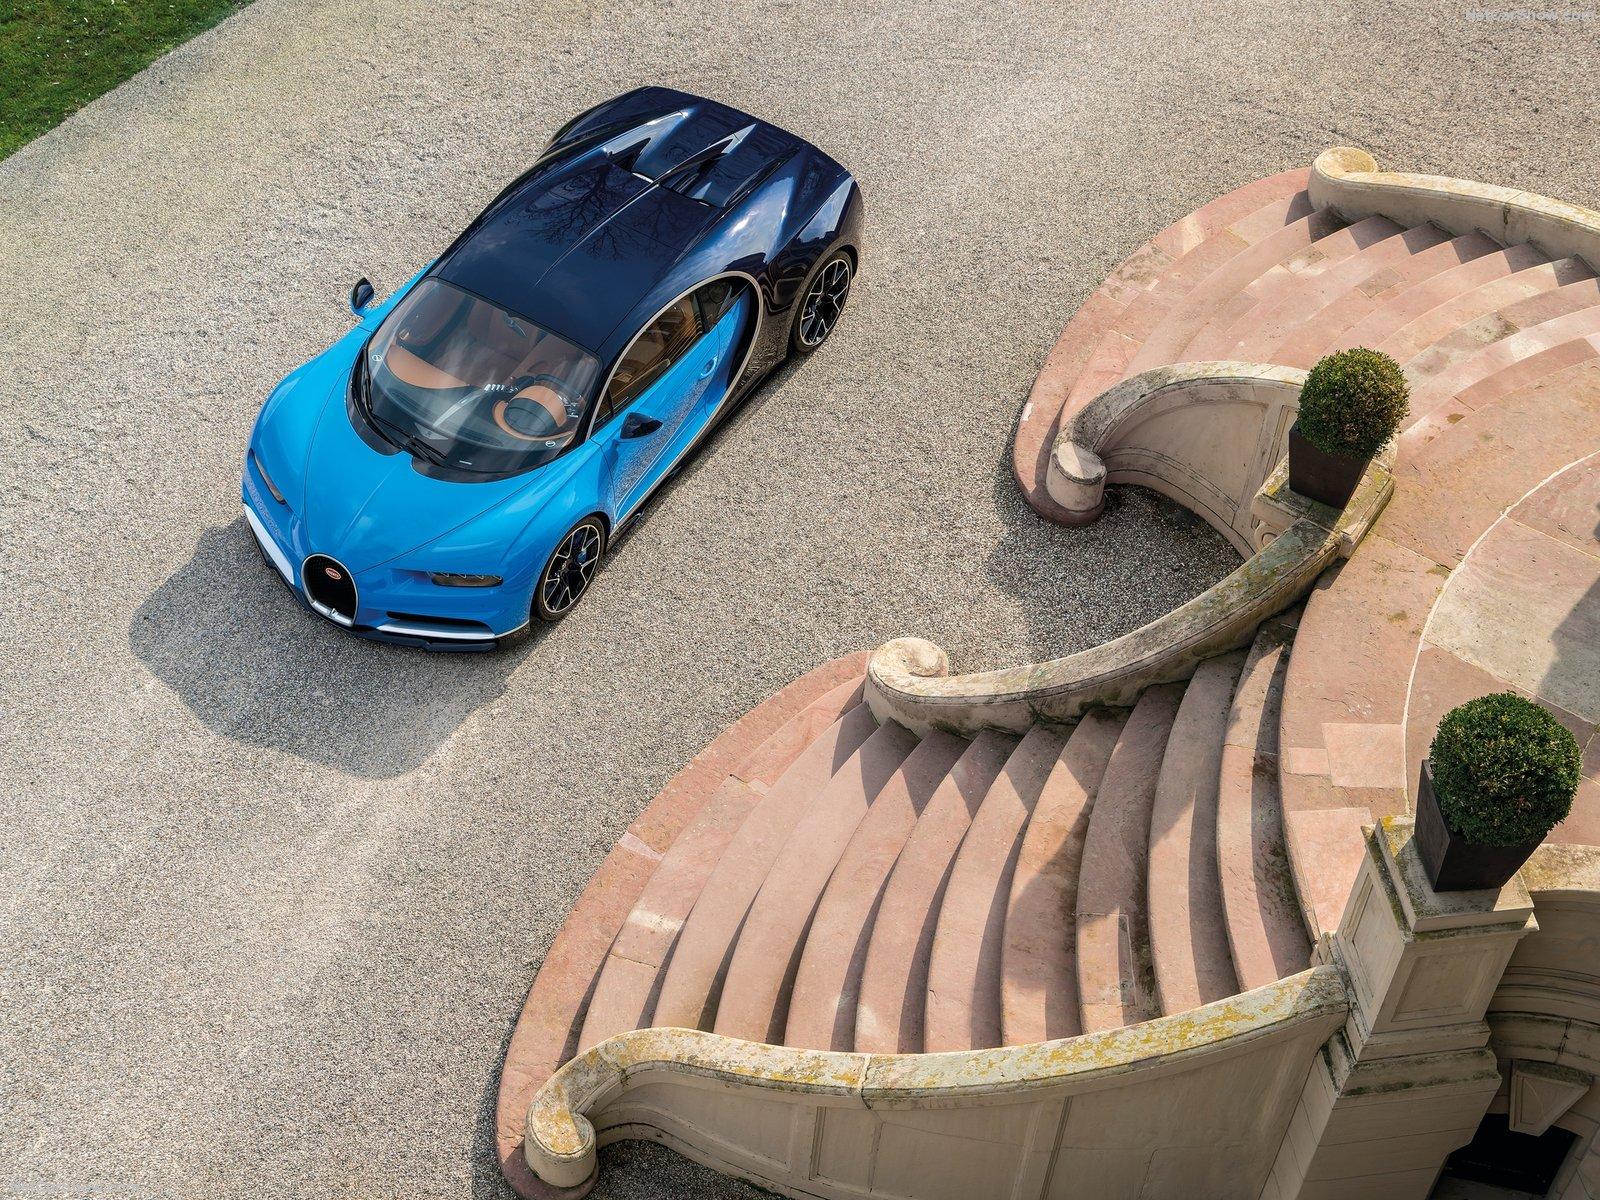 Bugatti-Chiron_2017_1600x1200_wallpaper_0f